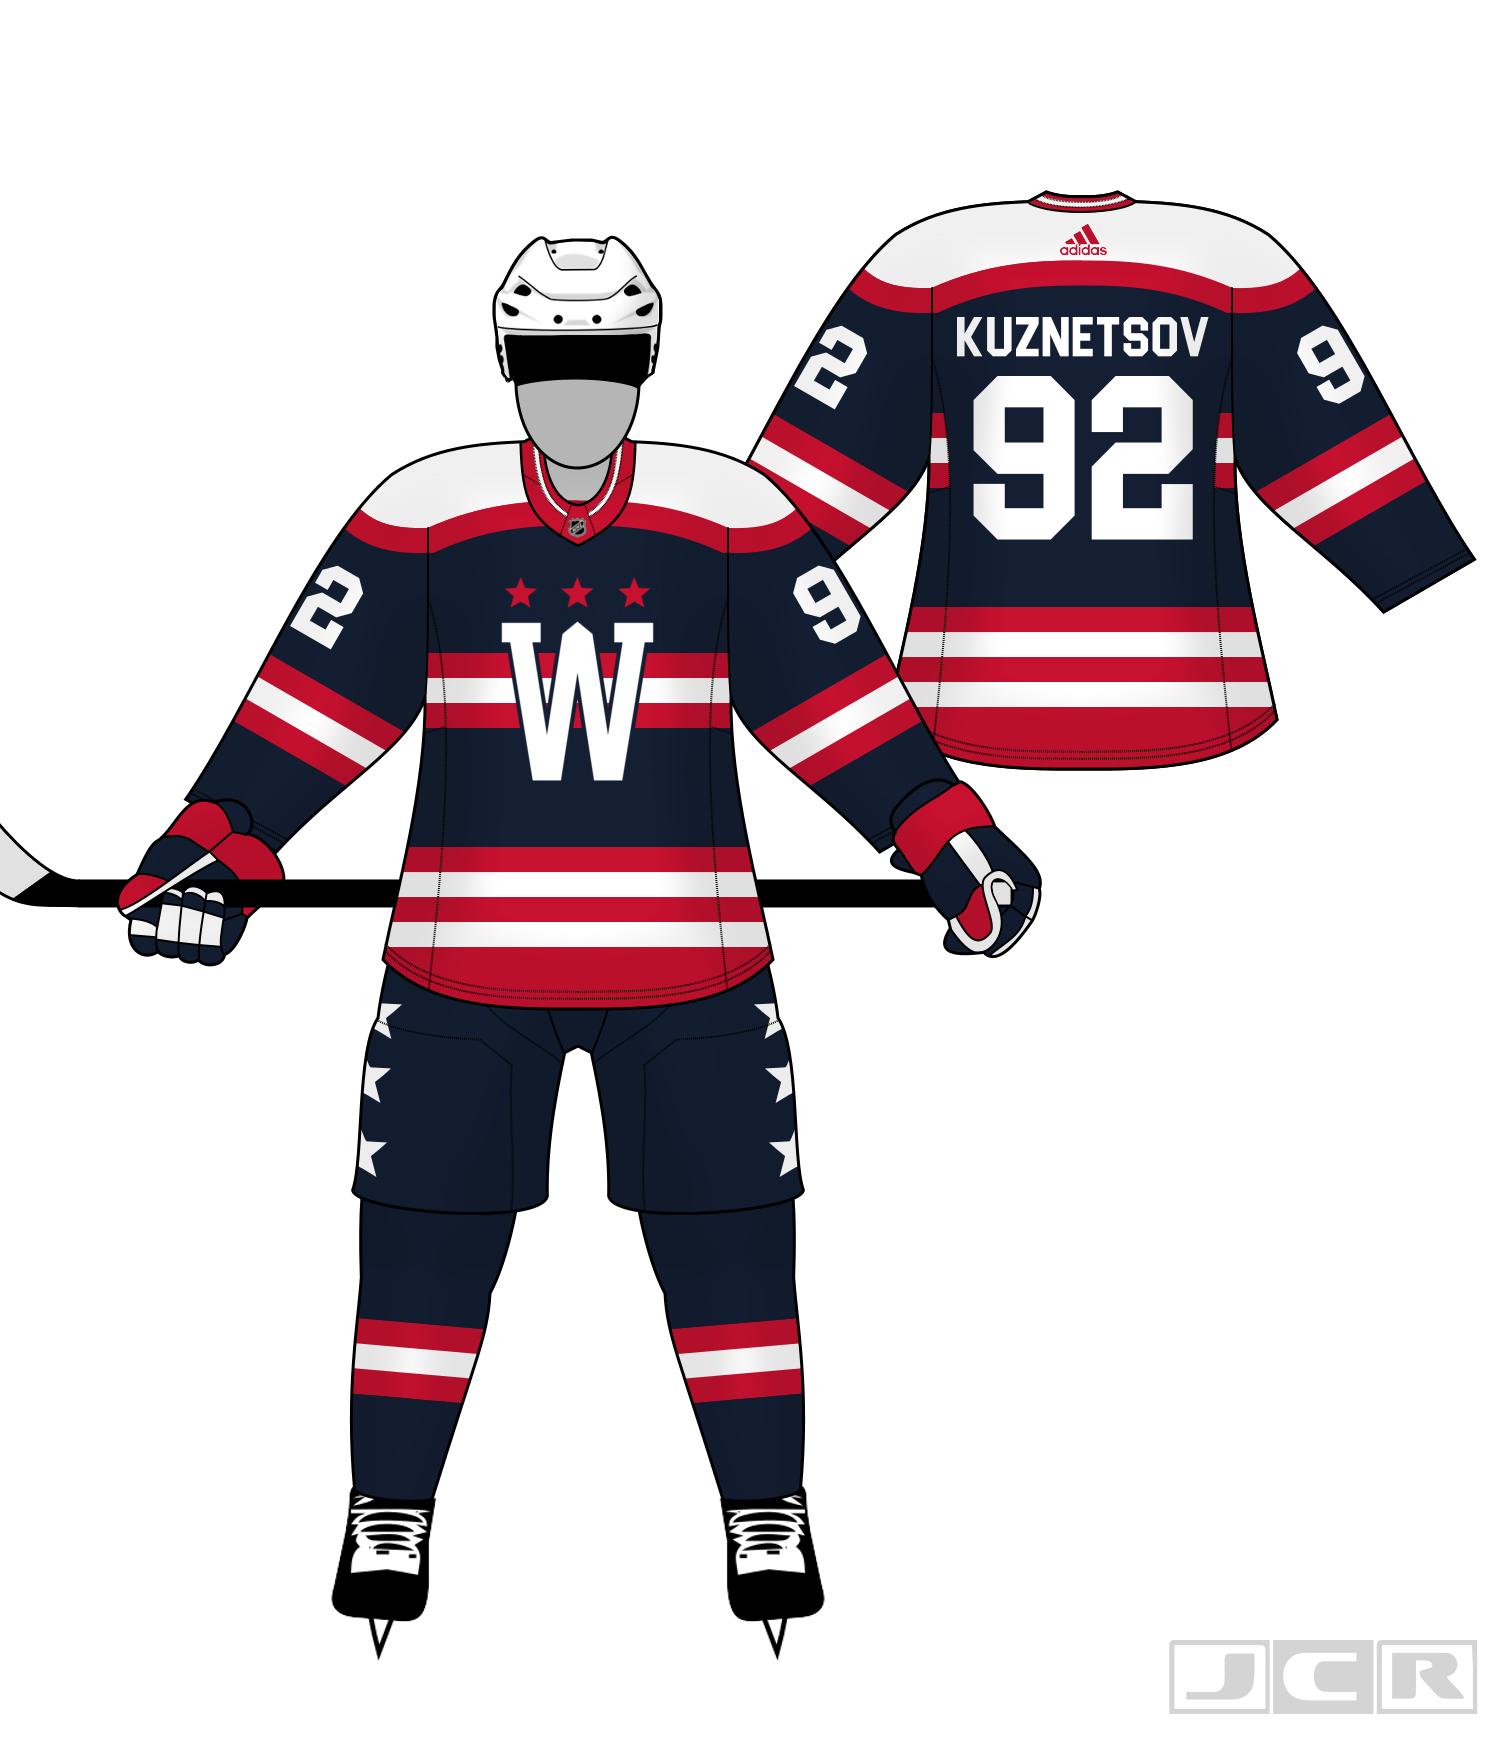 10009a31aae Washington Capitals Concepts - Concepts - Chris Creamer's Sports ...